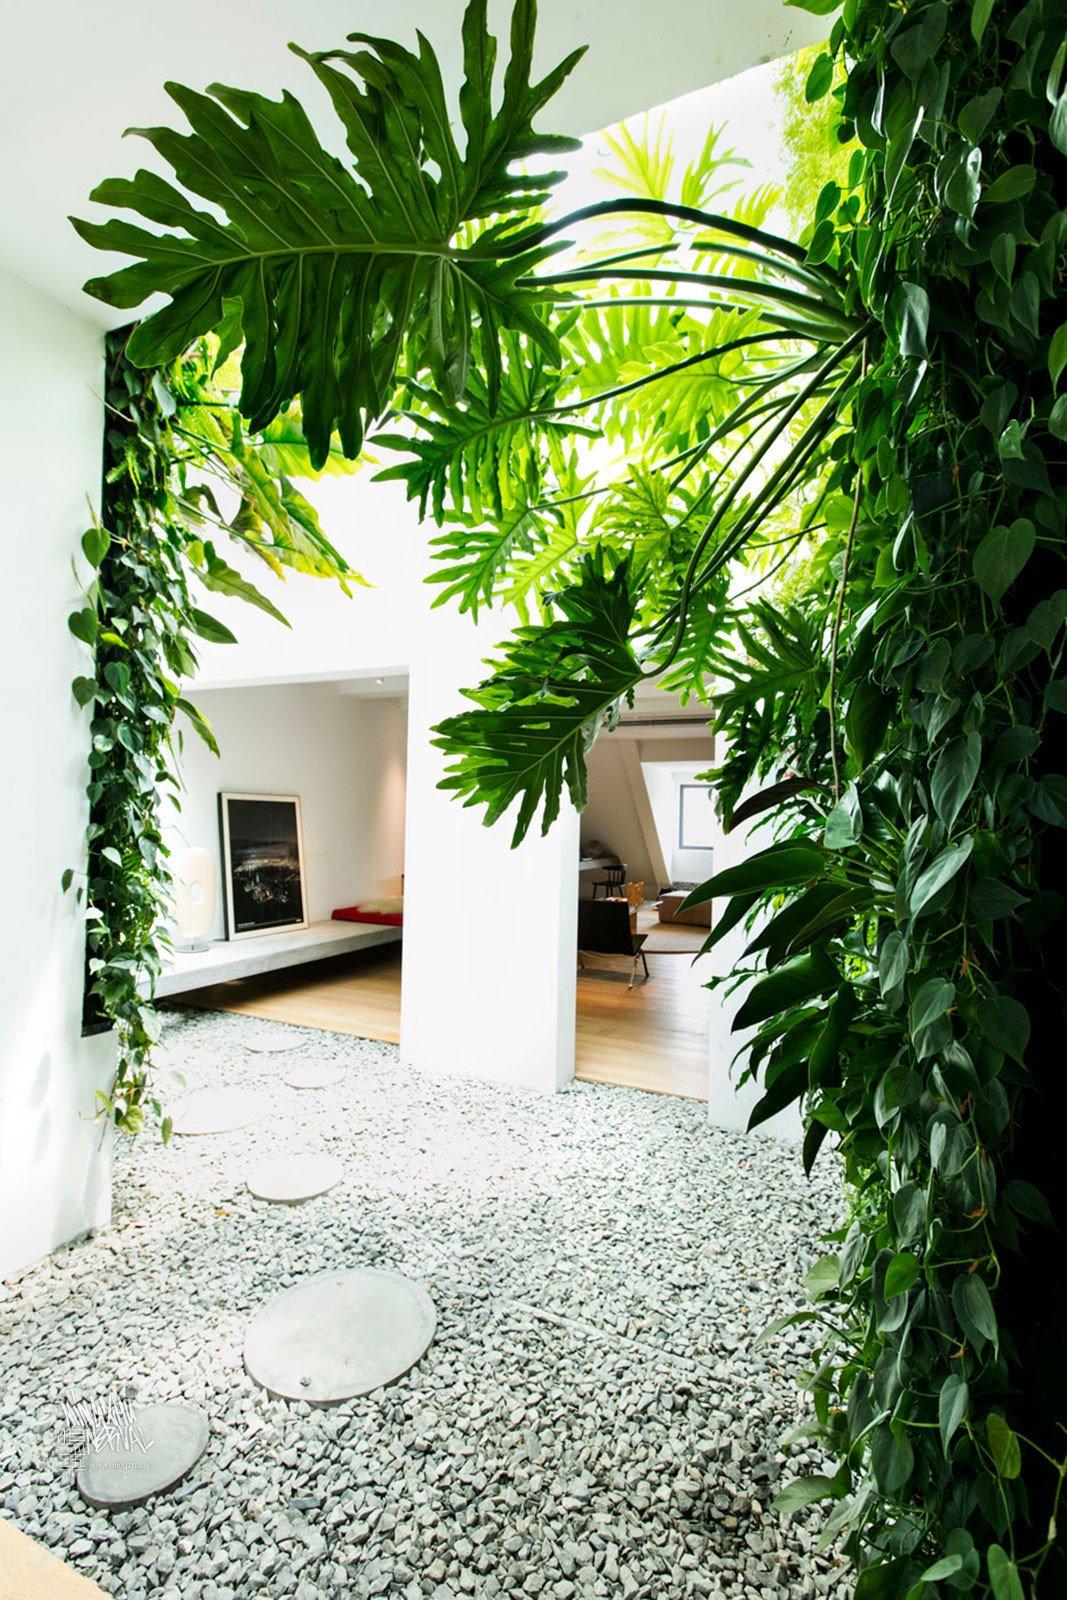 Mingzhu Nerval vertical living wall experts - luxury garden design, apartment in Shanghai, 2013